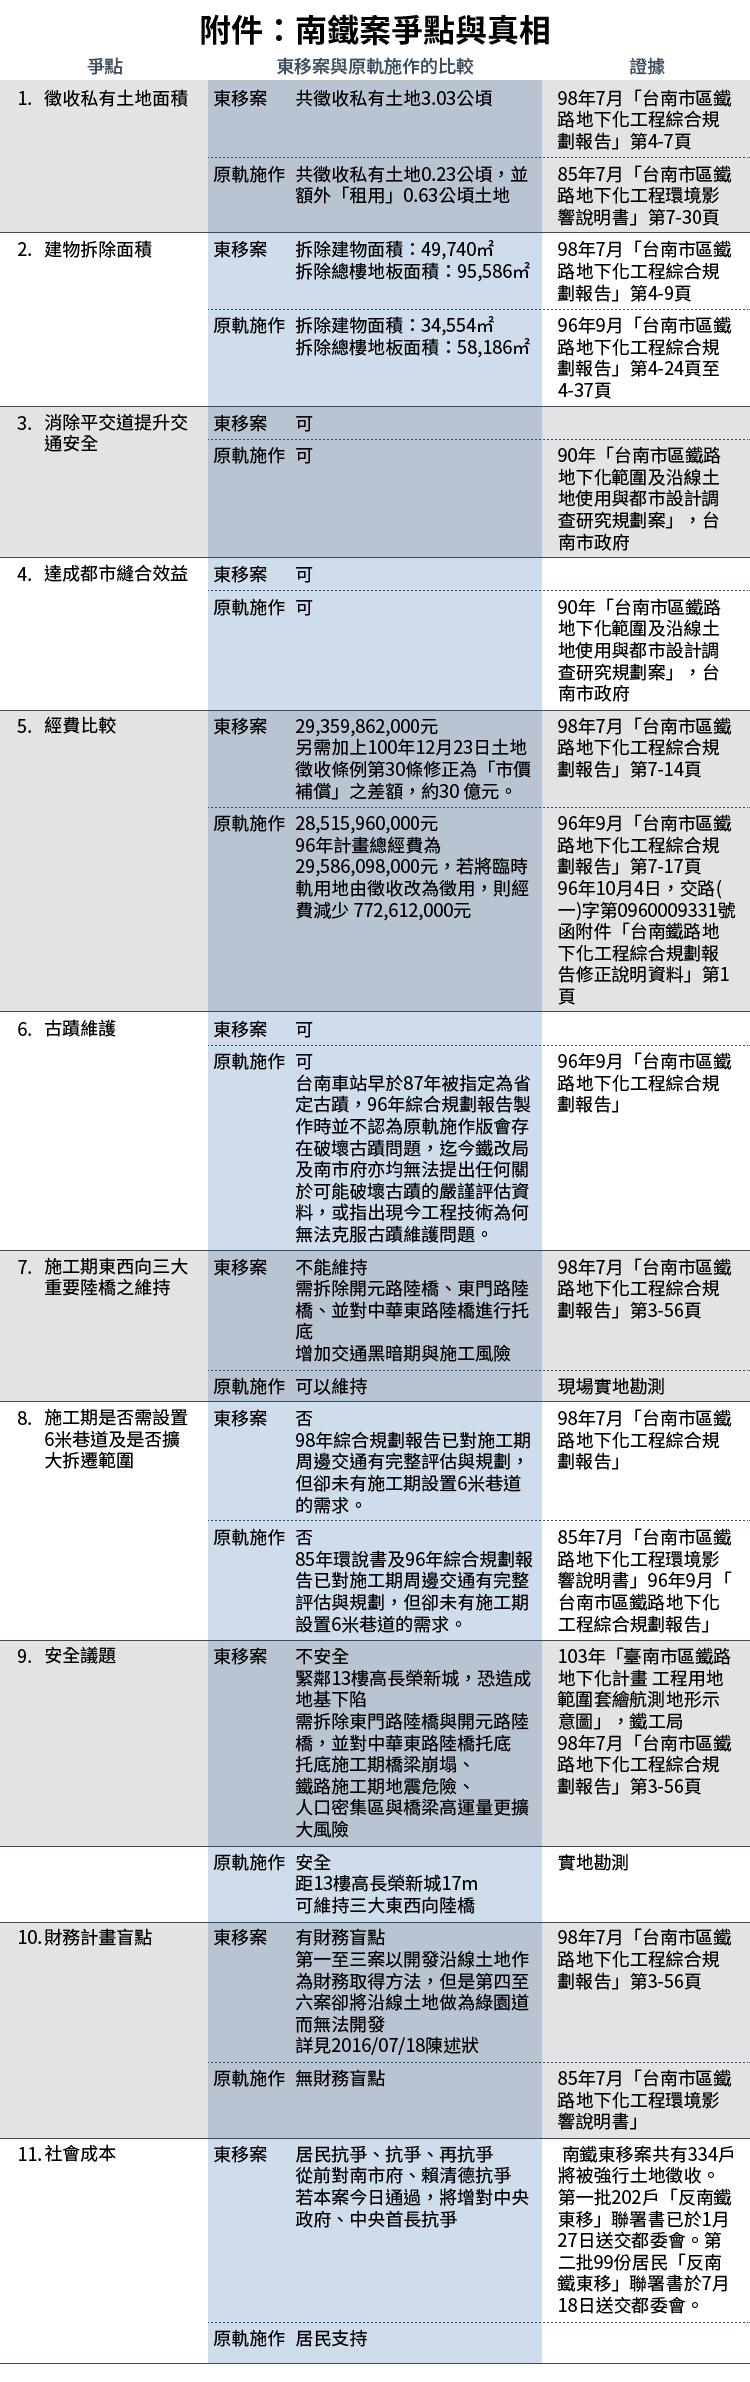 20160803-SMG0034-E01-附件:南鐵案爭點與真相-01.png